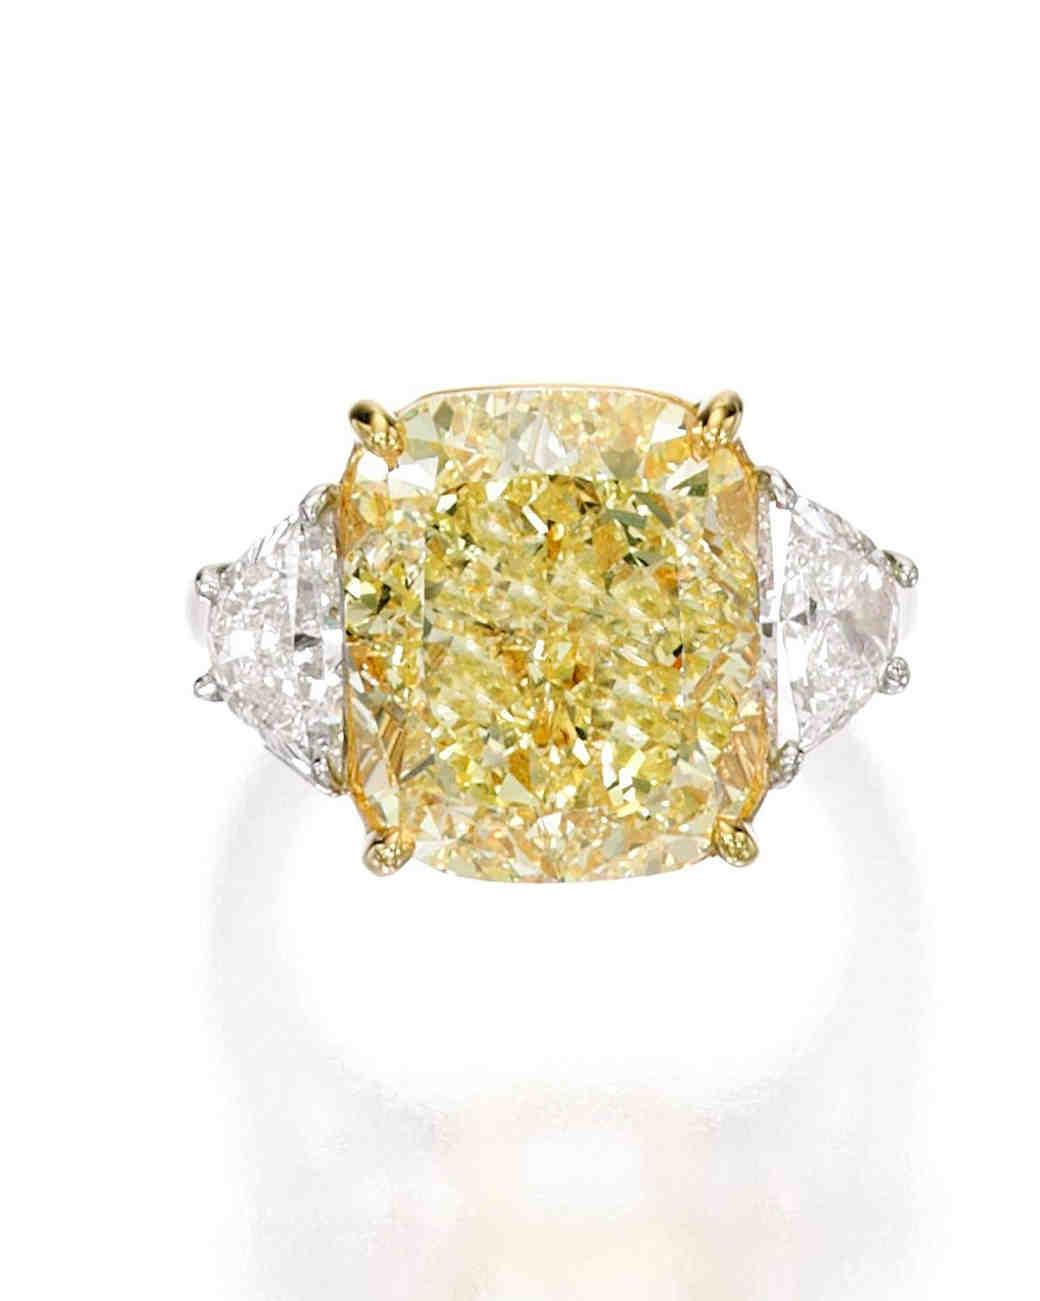 sothebys-ebay-auction-9331-lot-160-0415.jpg